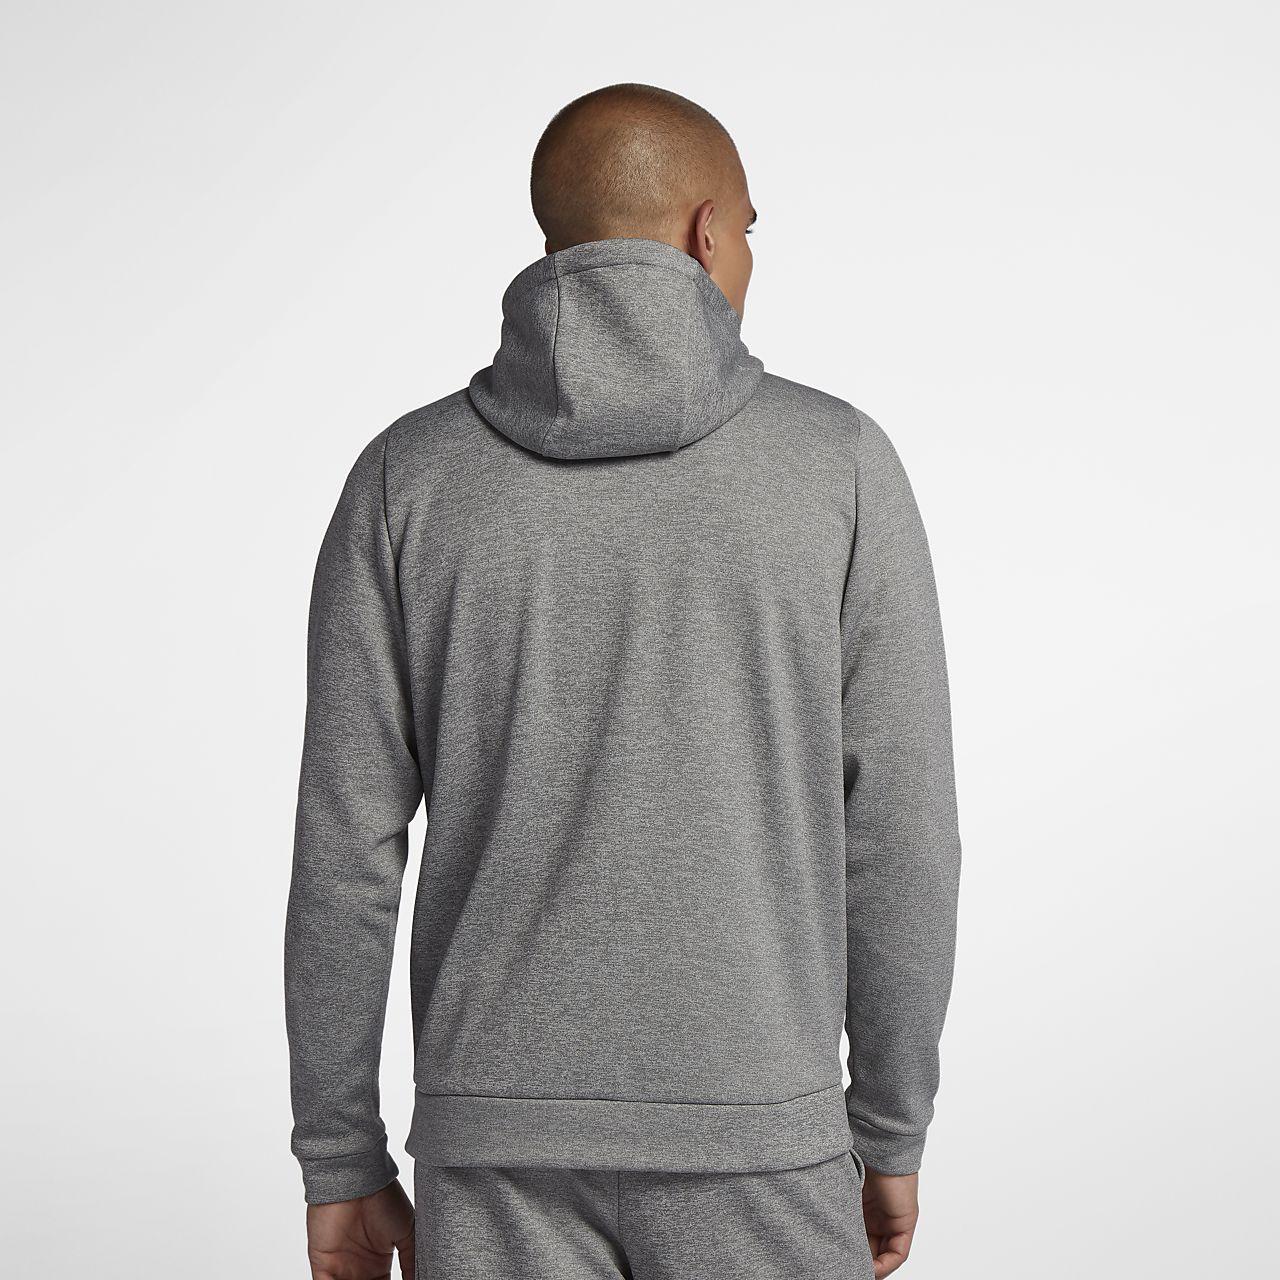 9a22d115 Nike Dri-FIT Therma Men's Full-Zip Training Hoodie. Nike.com NZ